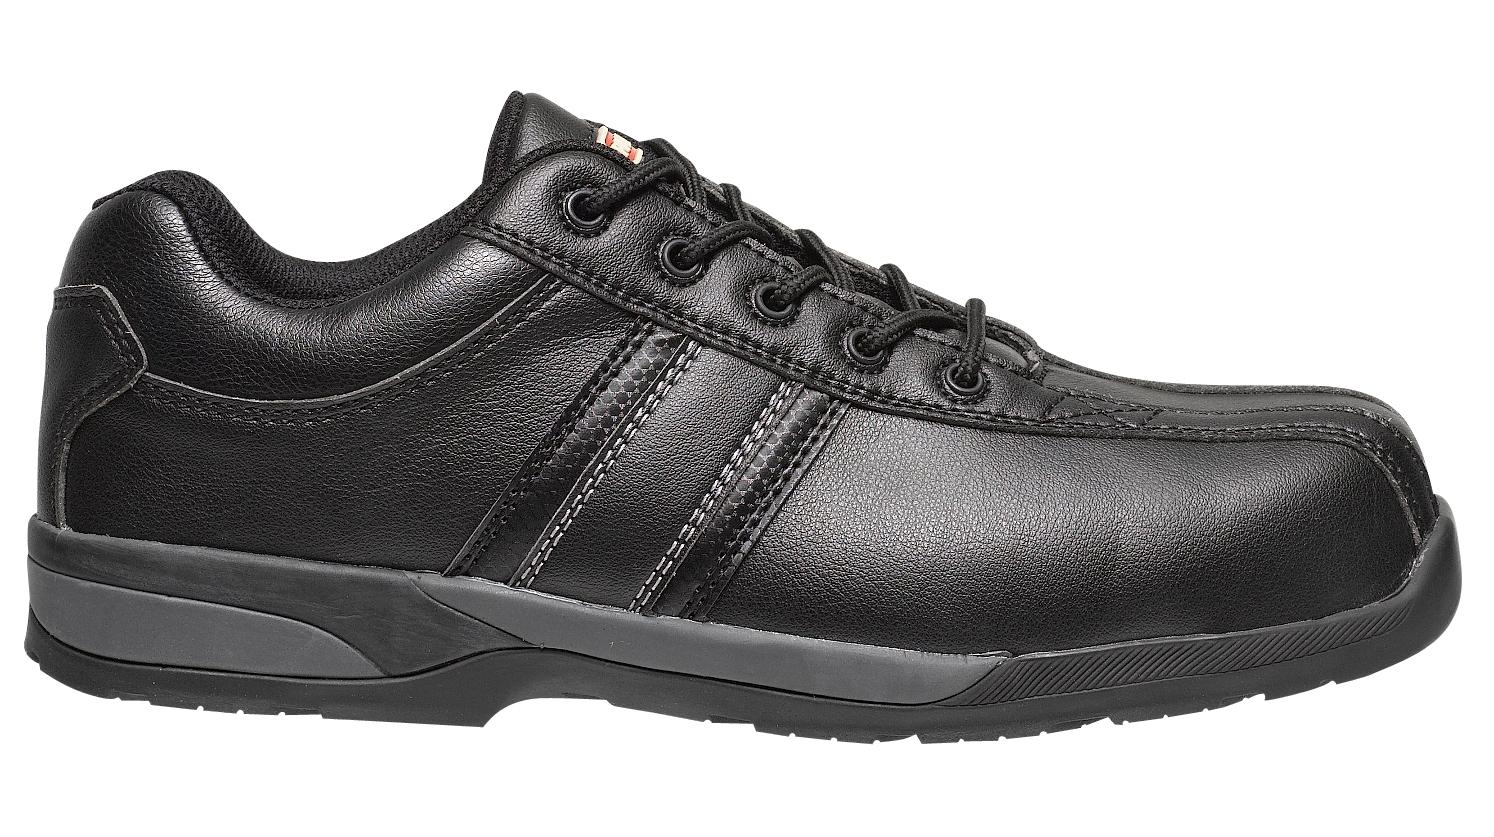 chaussures de s curit de sport parade rasta s3. Black Bedroom Furniture Sets. Home Design Ideas